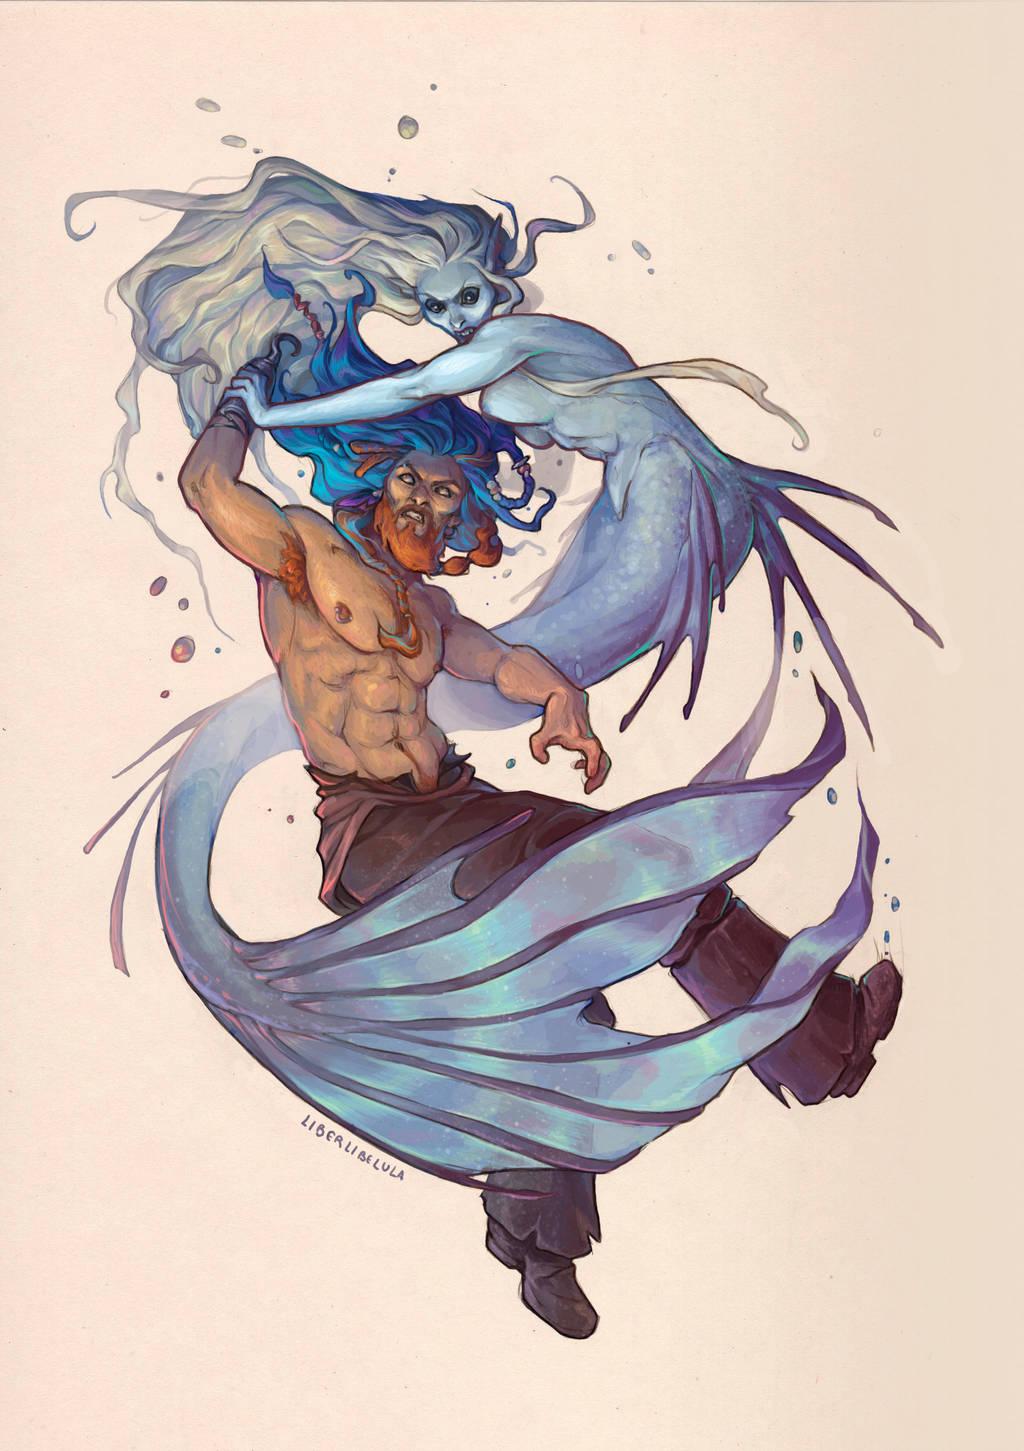 Mermaid and Captain by LiberLibelula